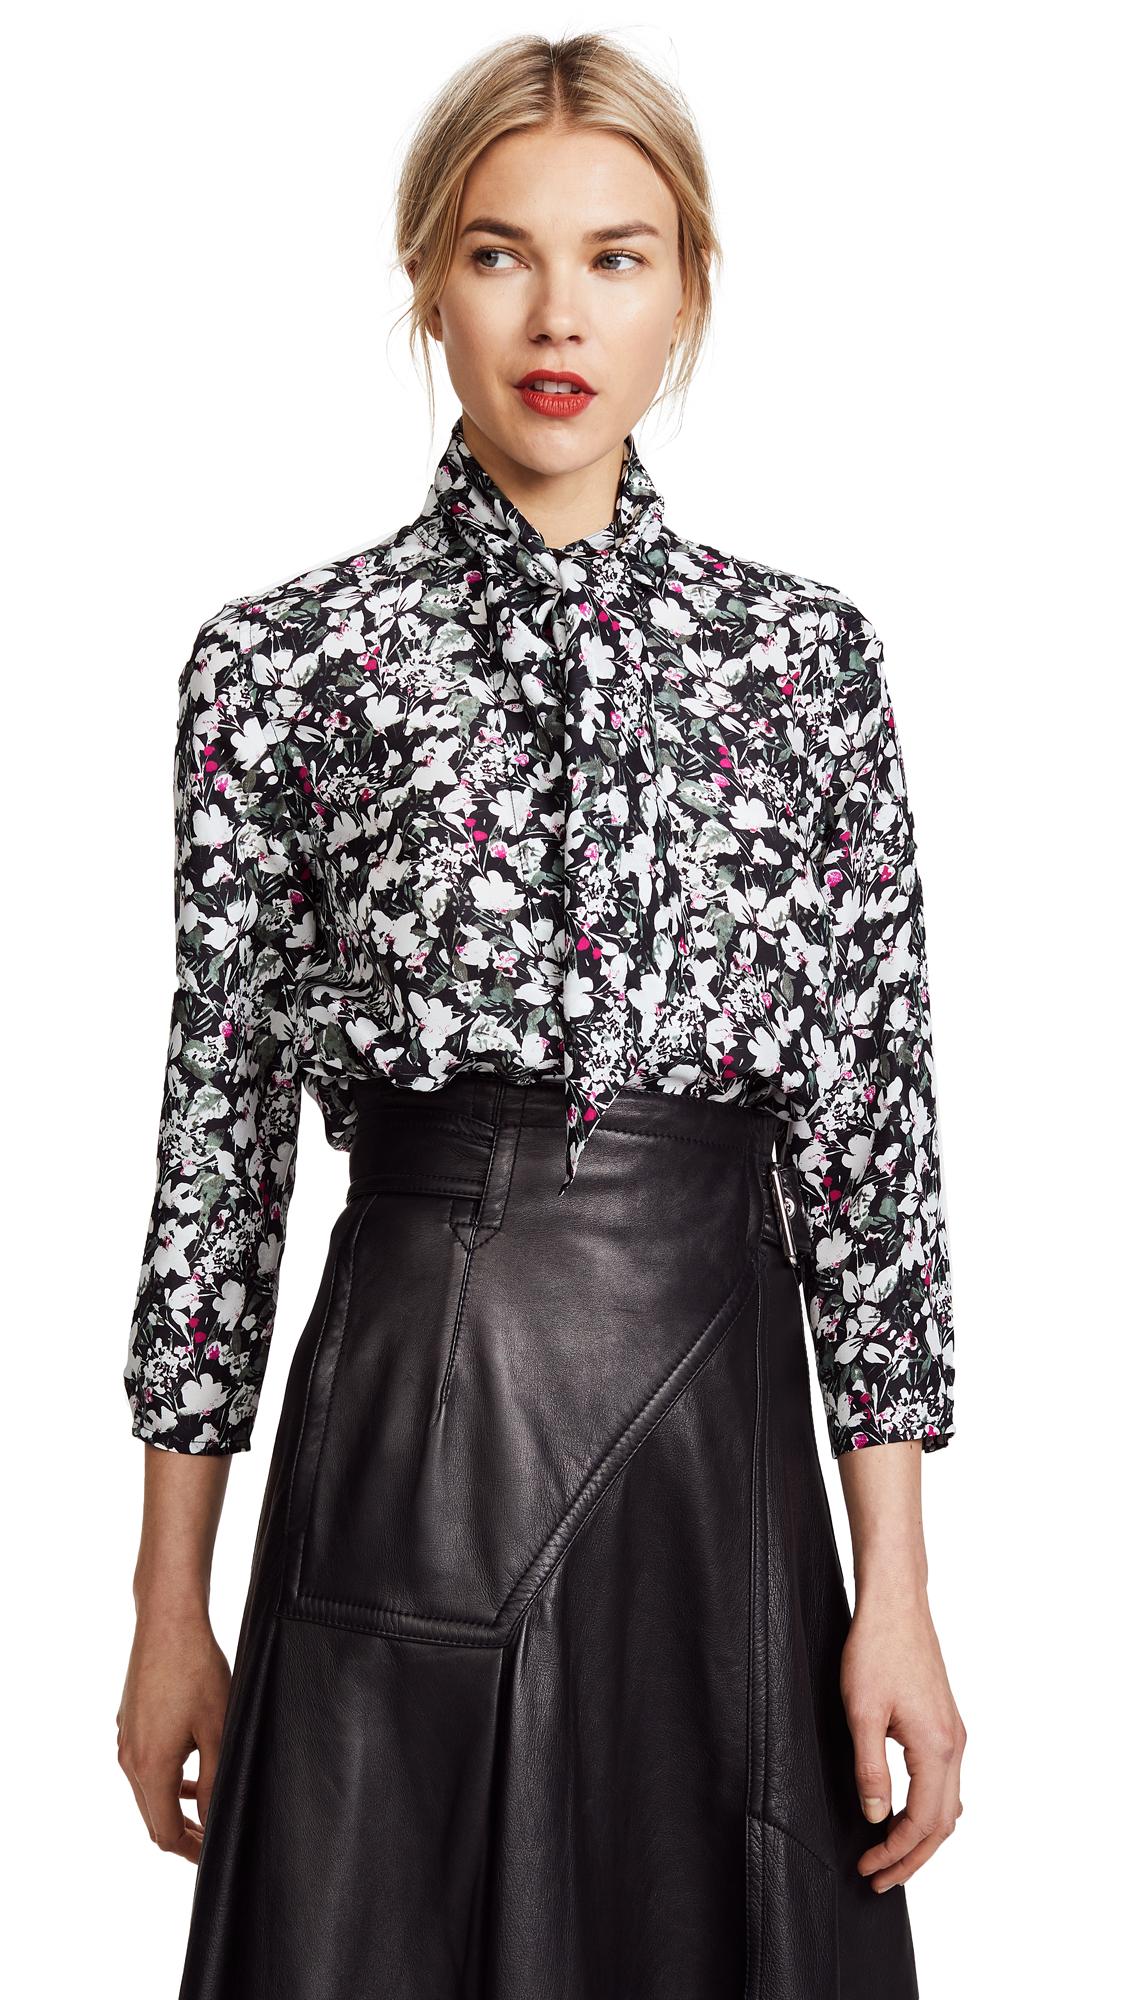 Acne Studios Bodil Silk Top - Flower Black